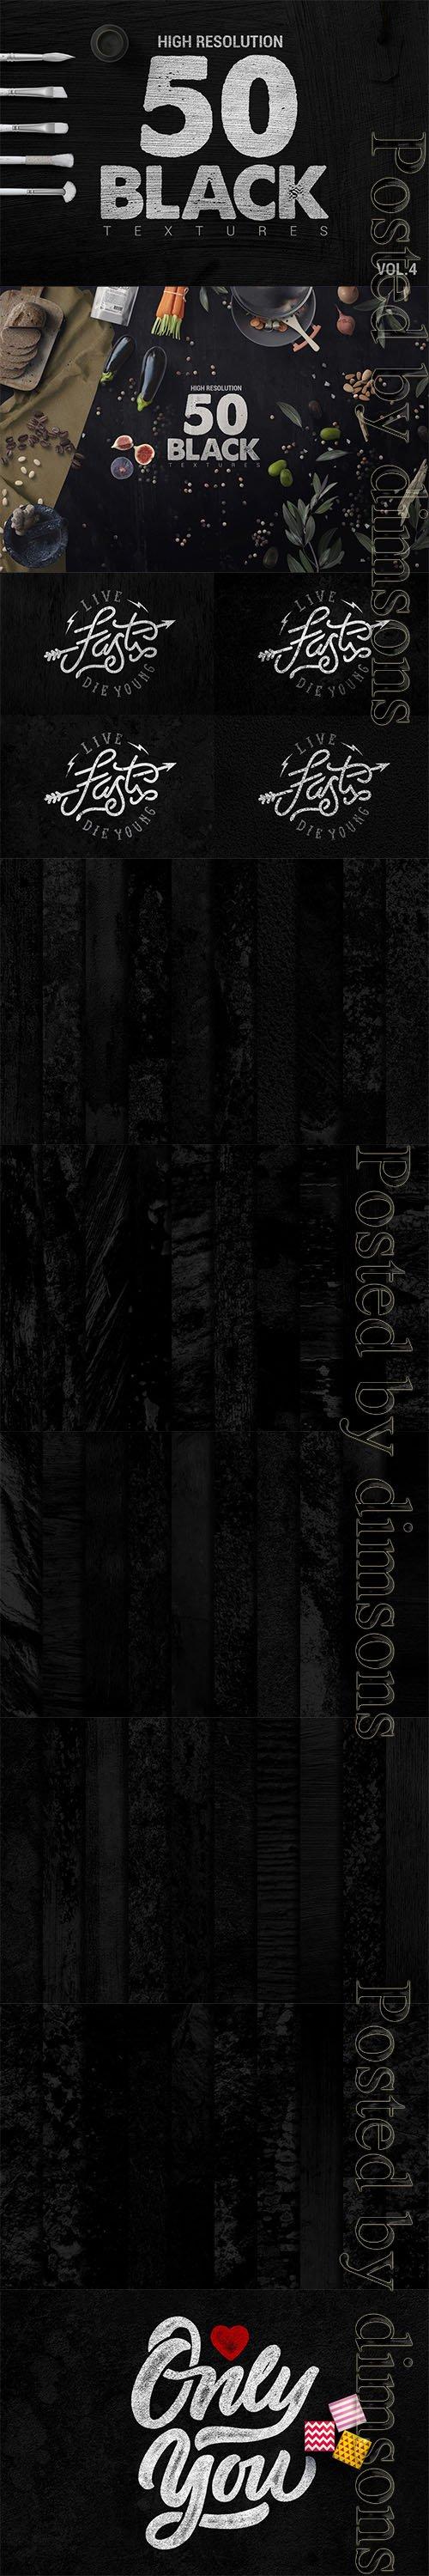 Bundle Black Textures Vol4 x50